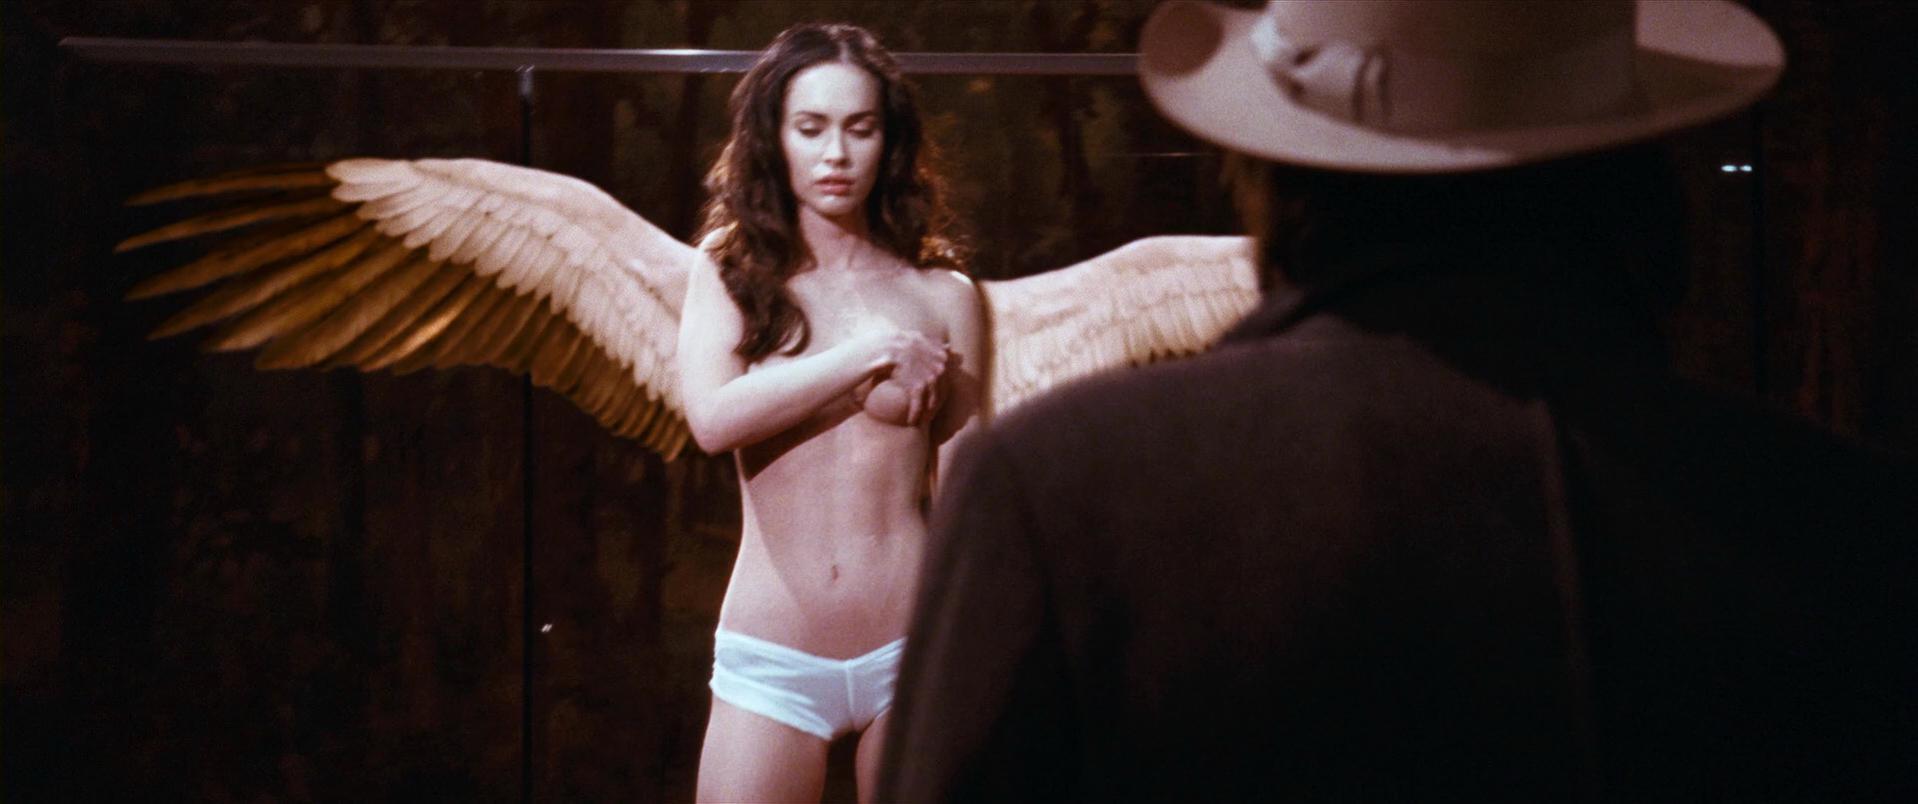 sex passion nude scene